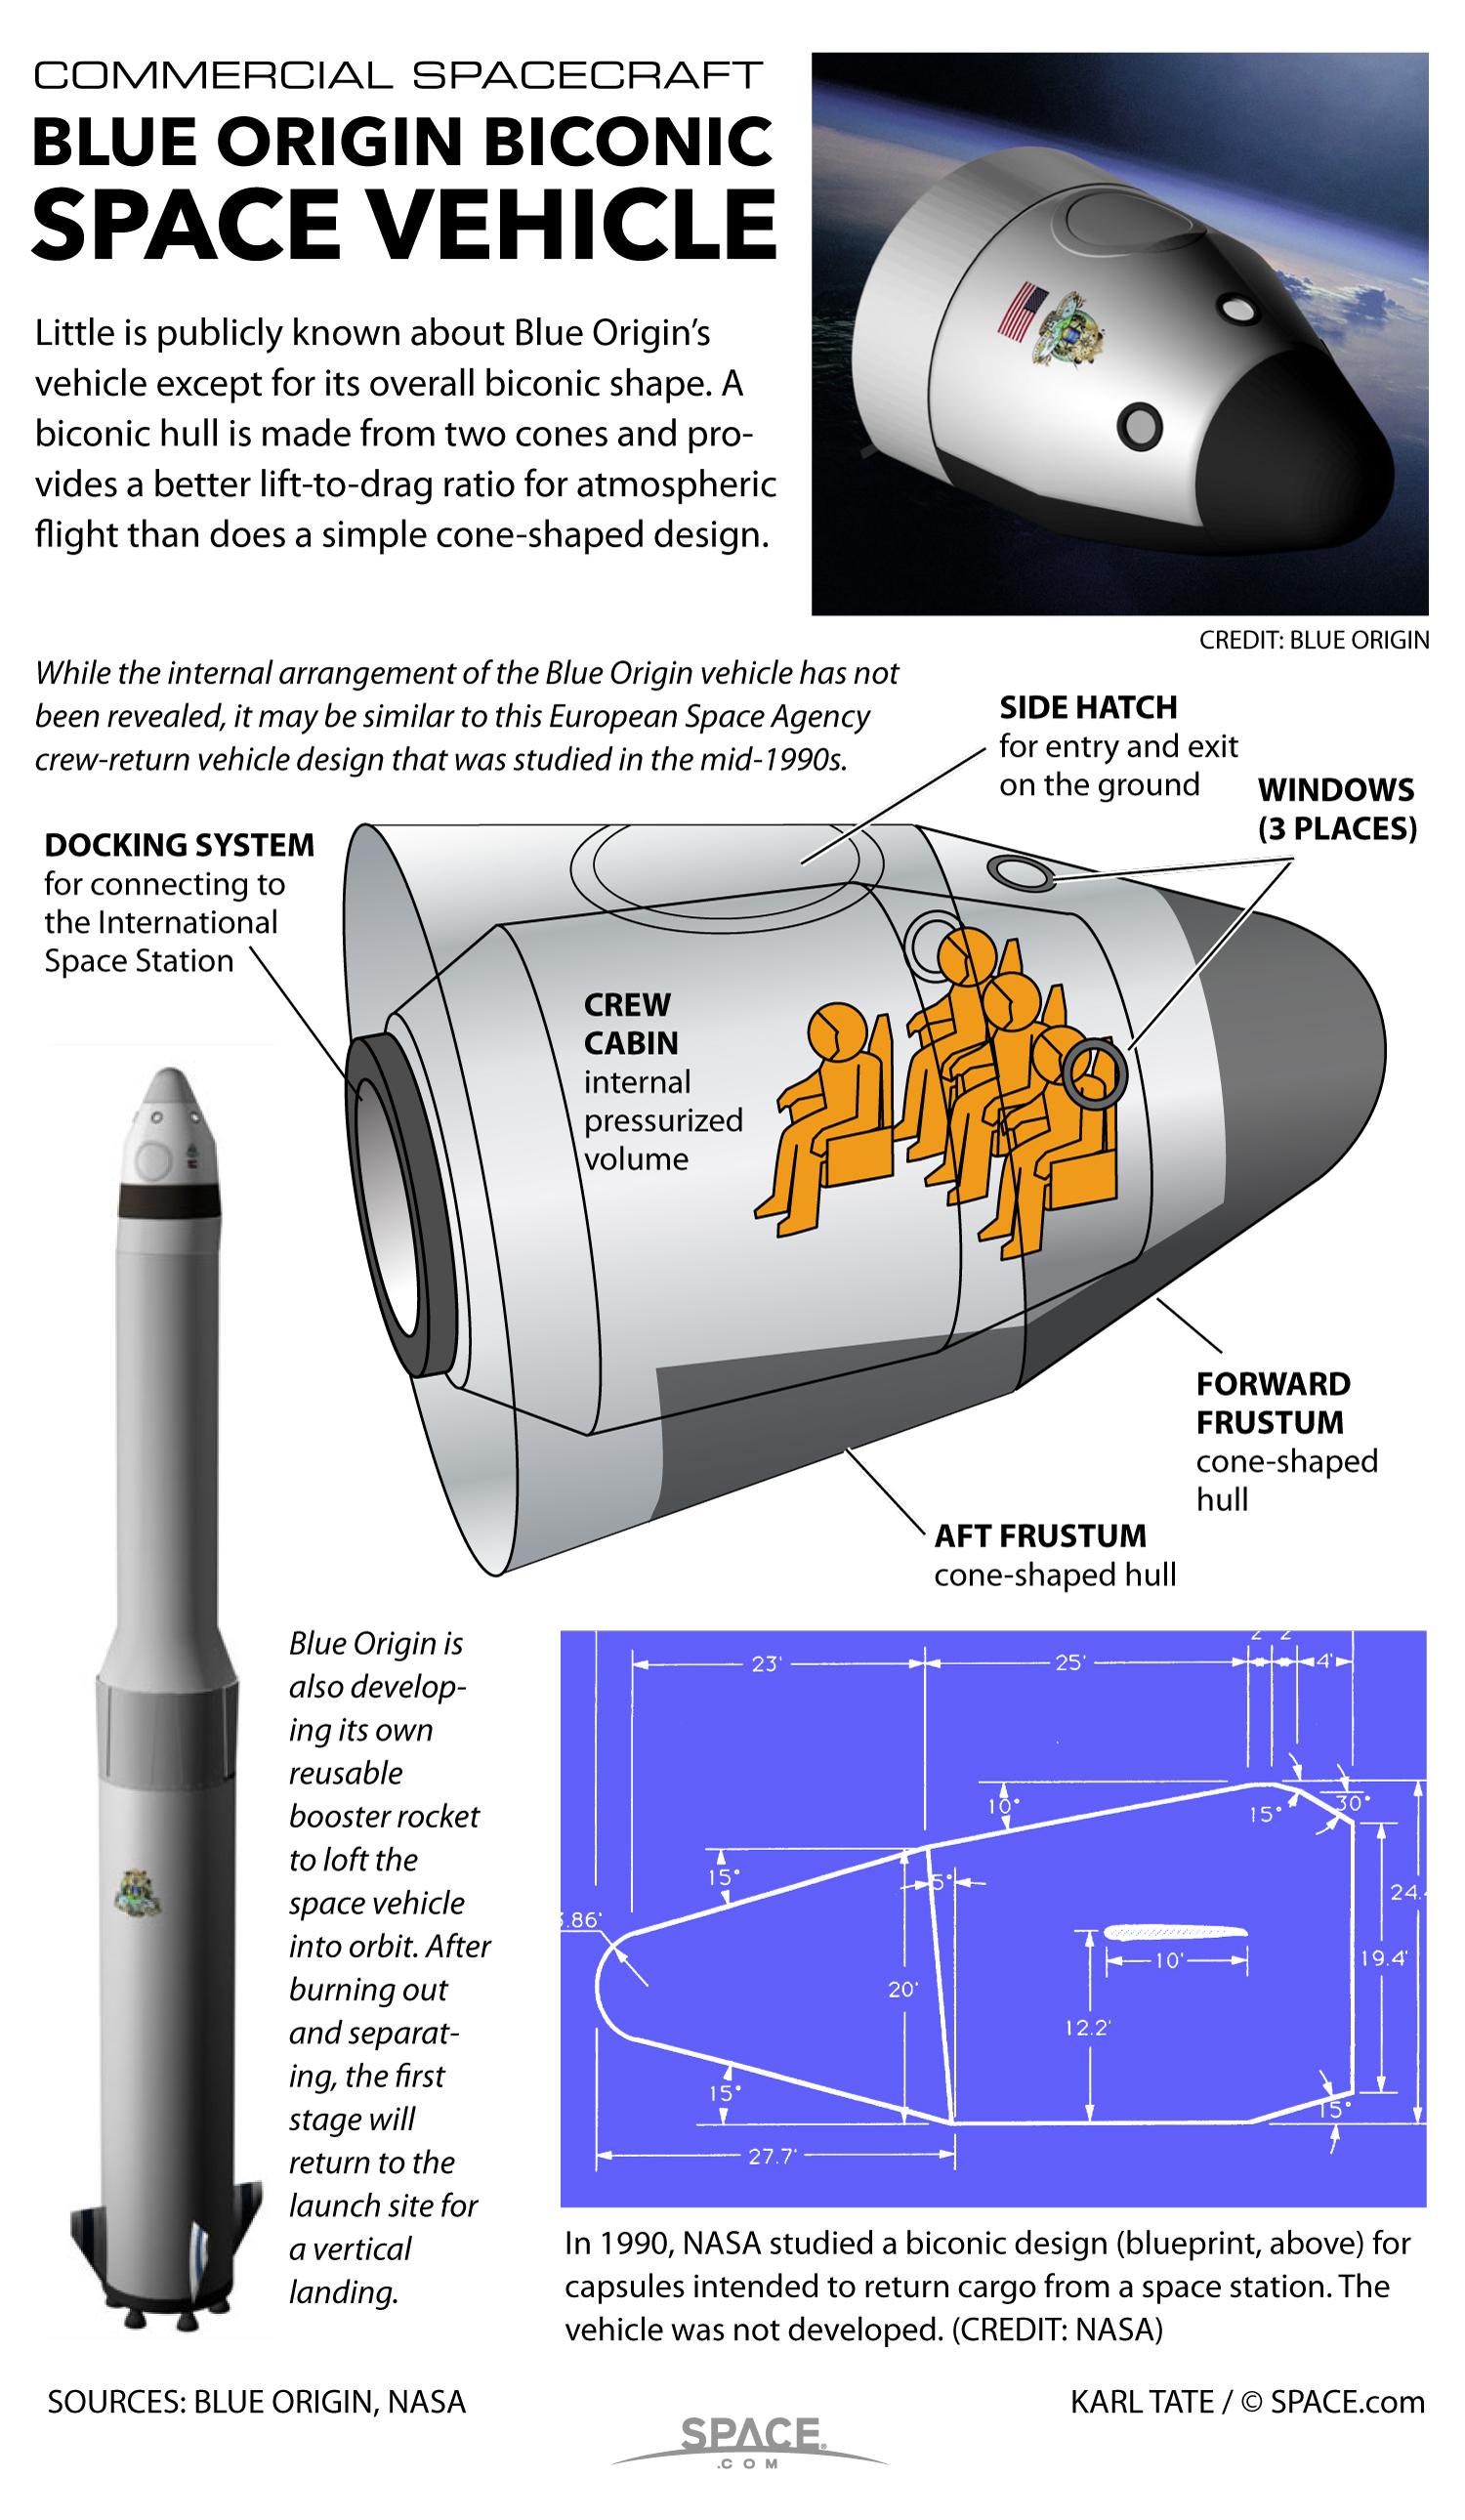 Blue Origin's Secretive Space Vehicle Explained (Infographic)